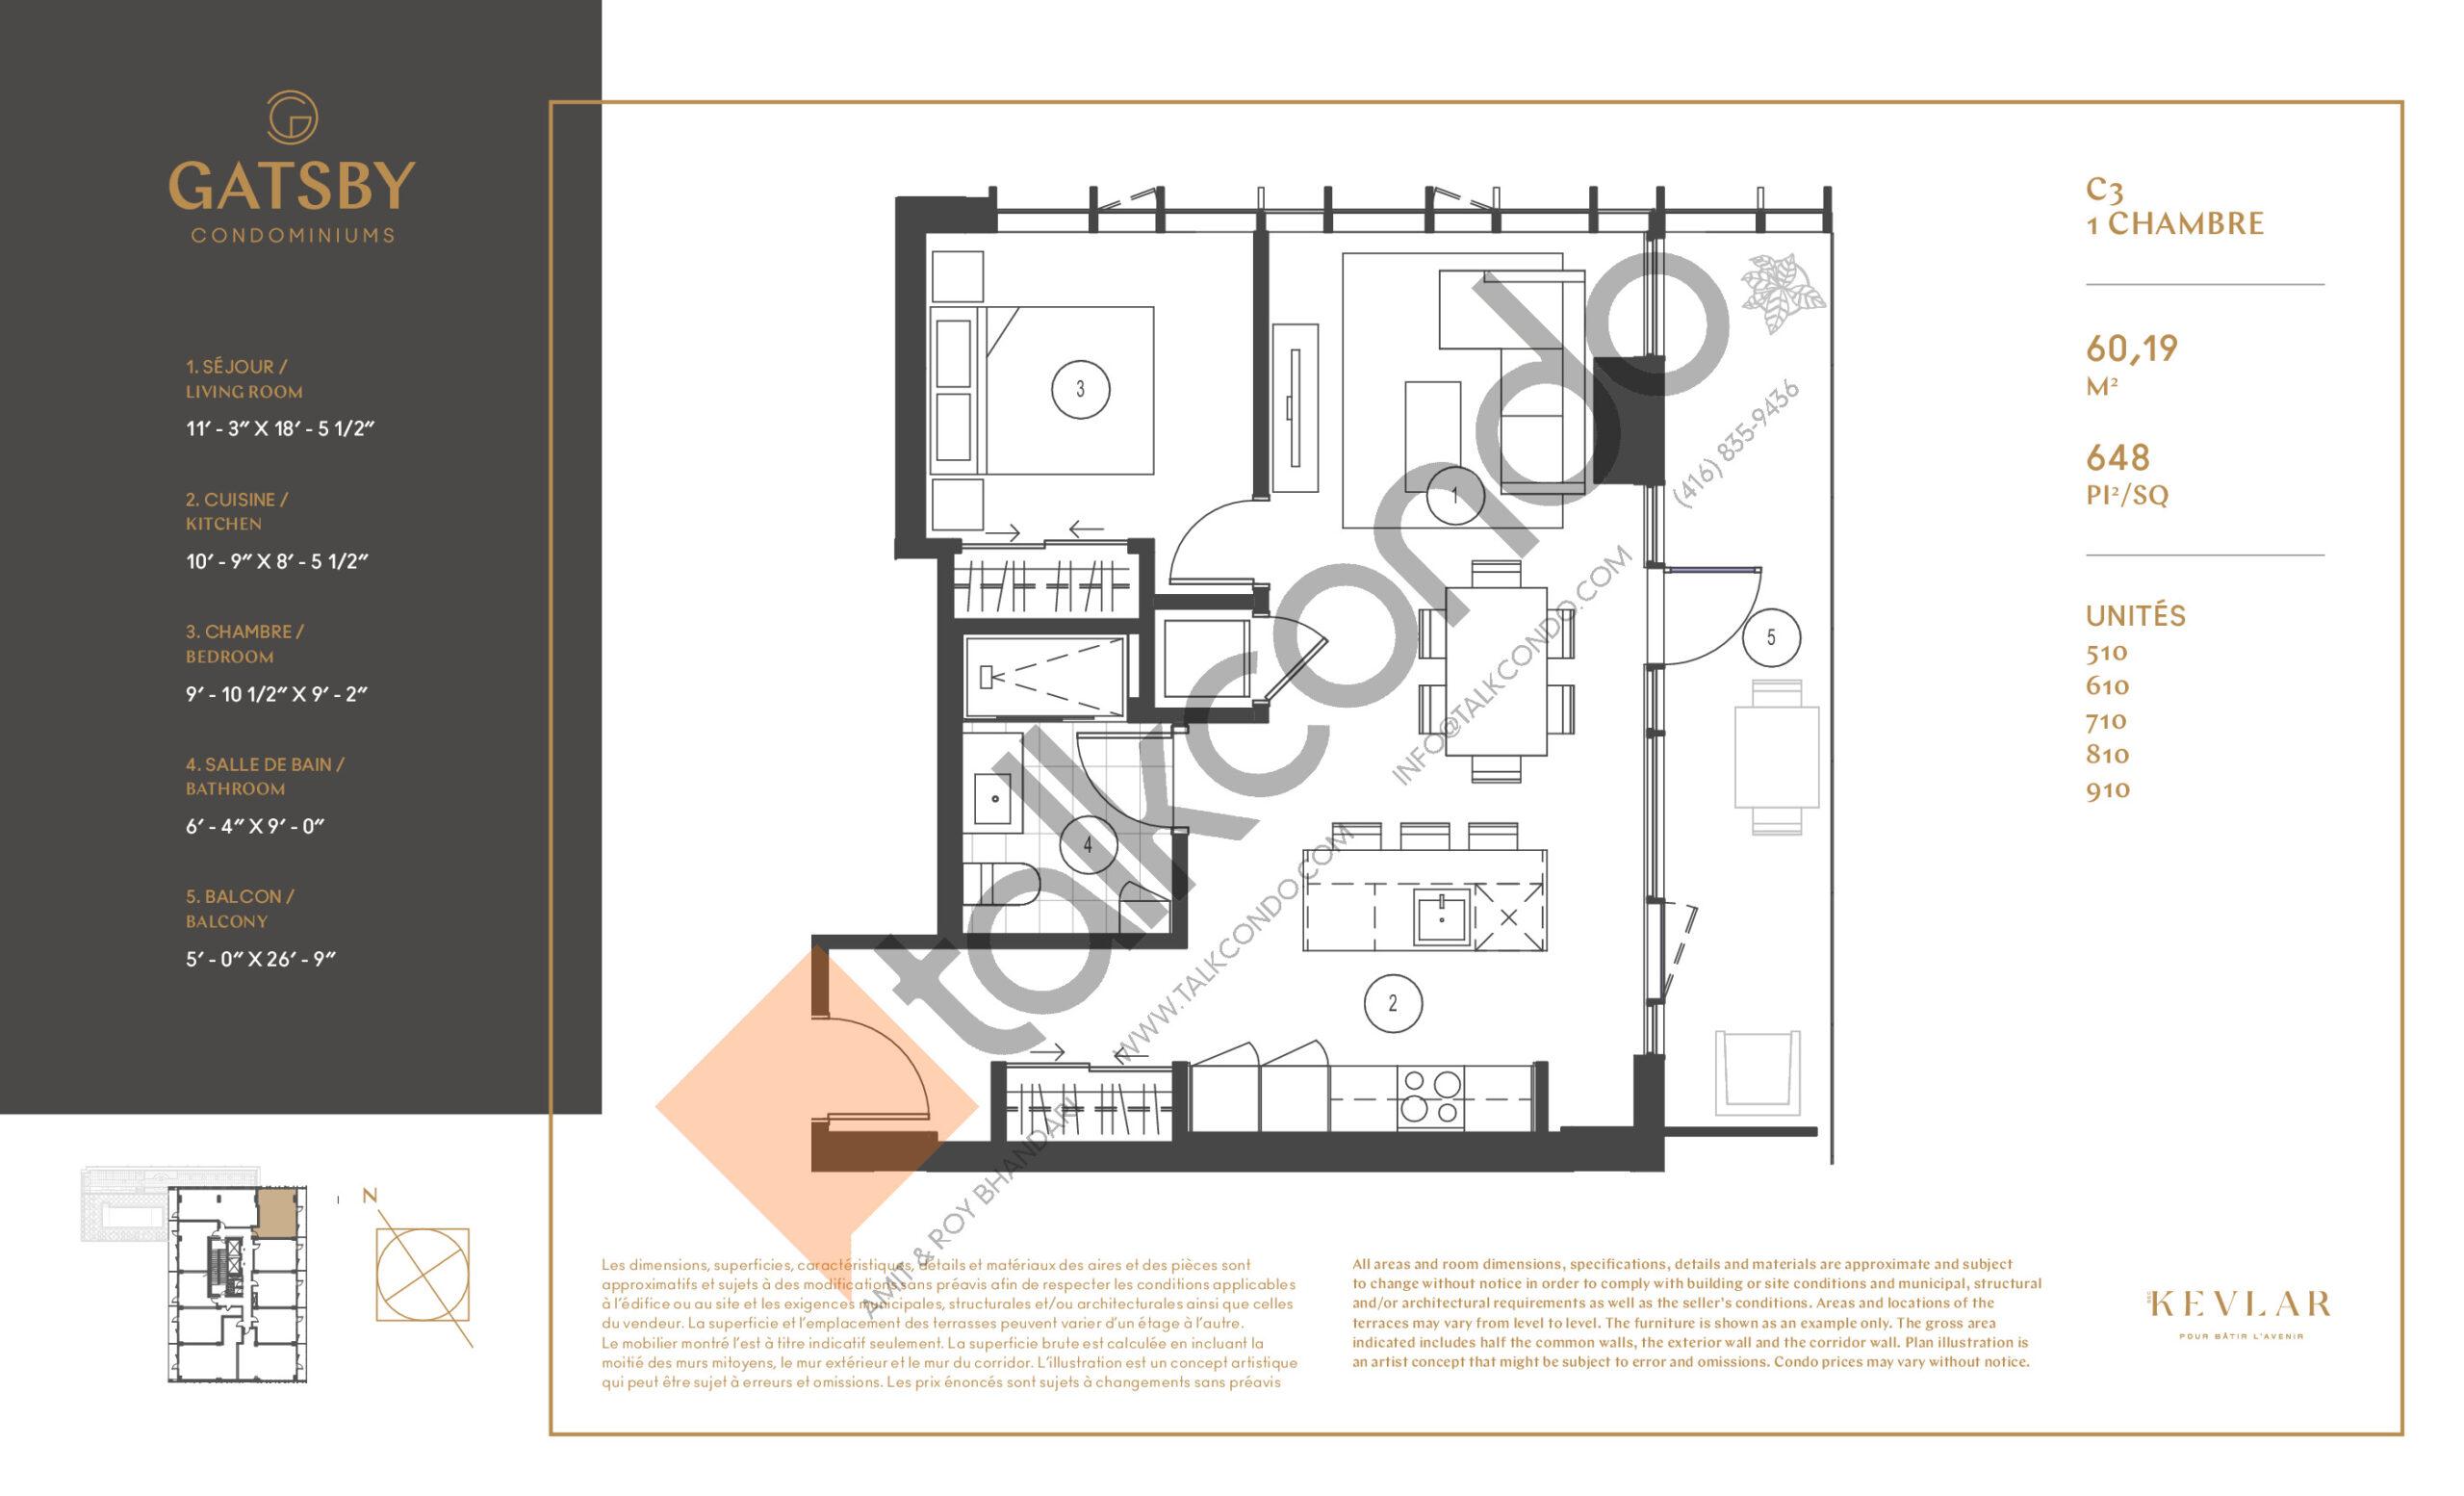 C3 Floor Plan at Gatsby Condos - 648 sq.ft